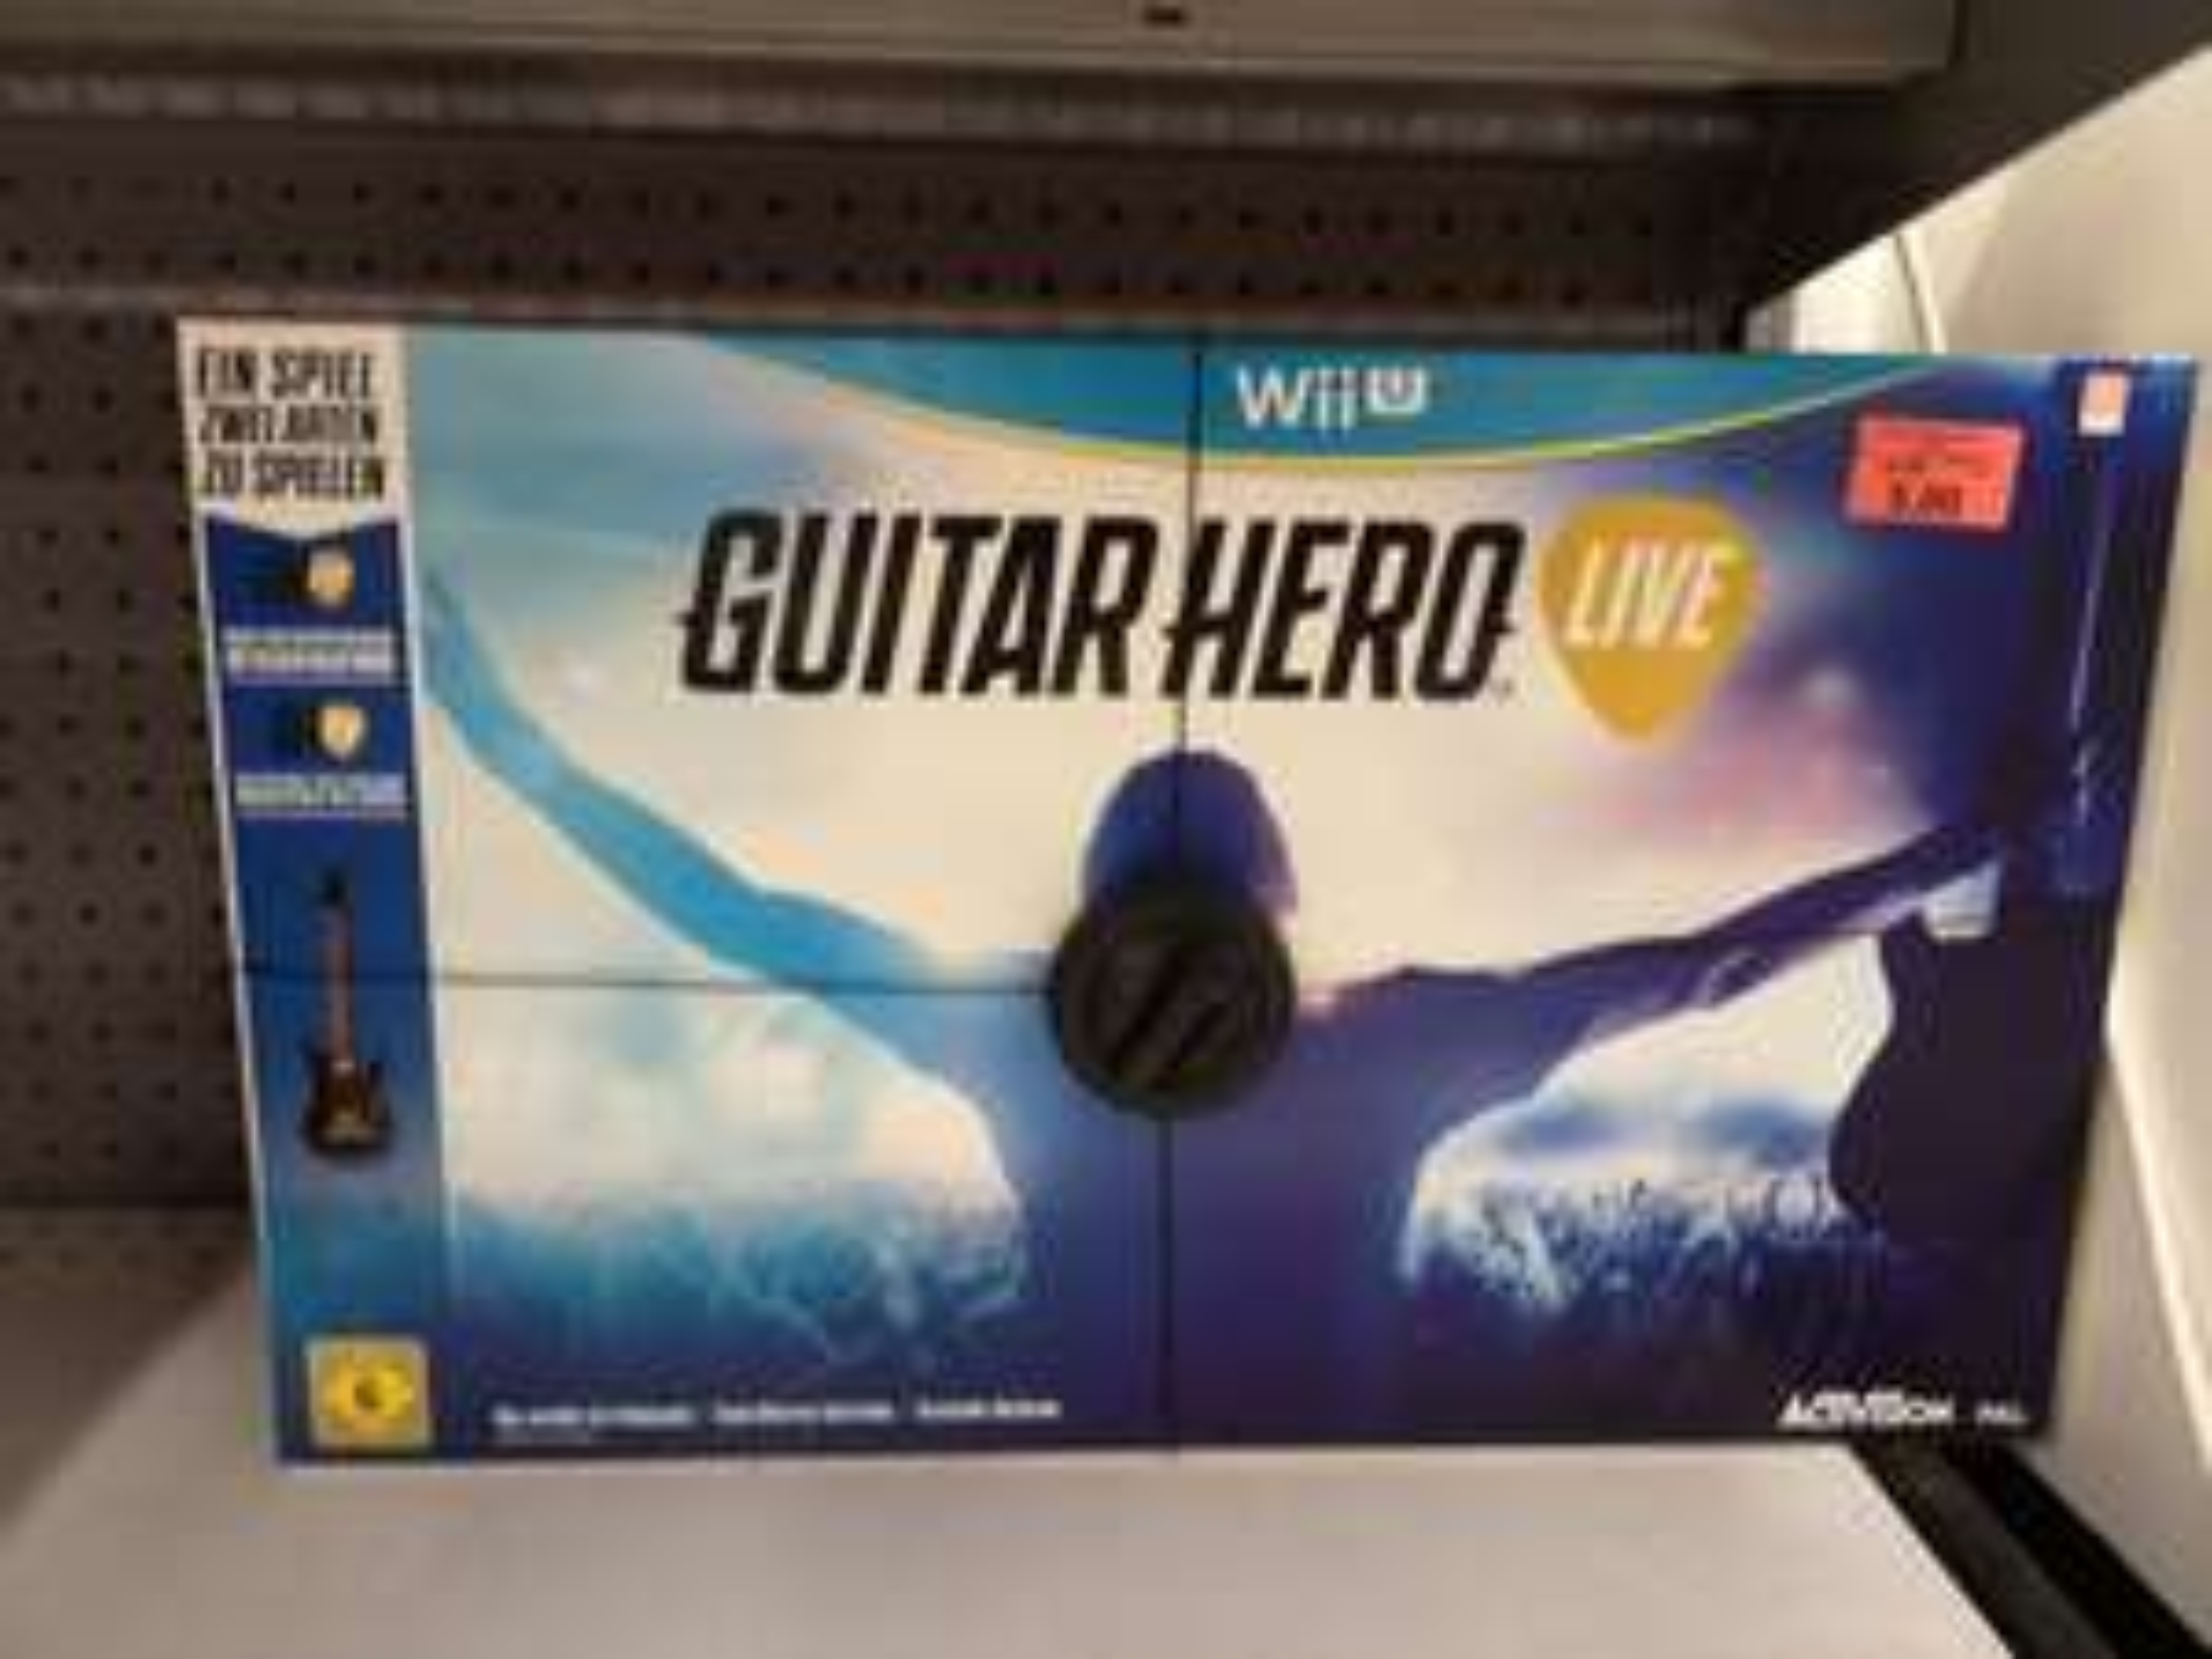 Guitar Hero Live - Wii U (Lokal Toys'r Us Recklinghausen)